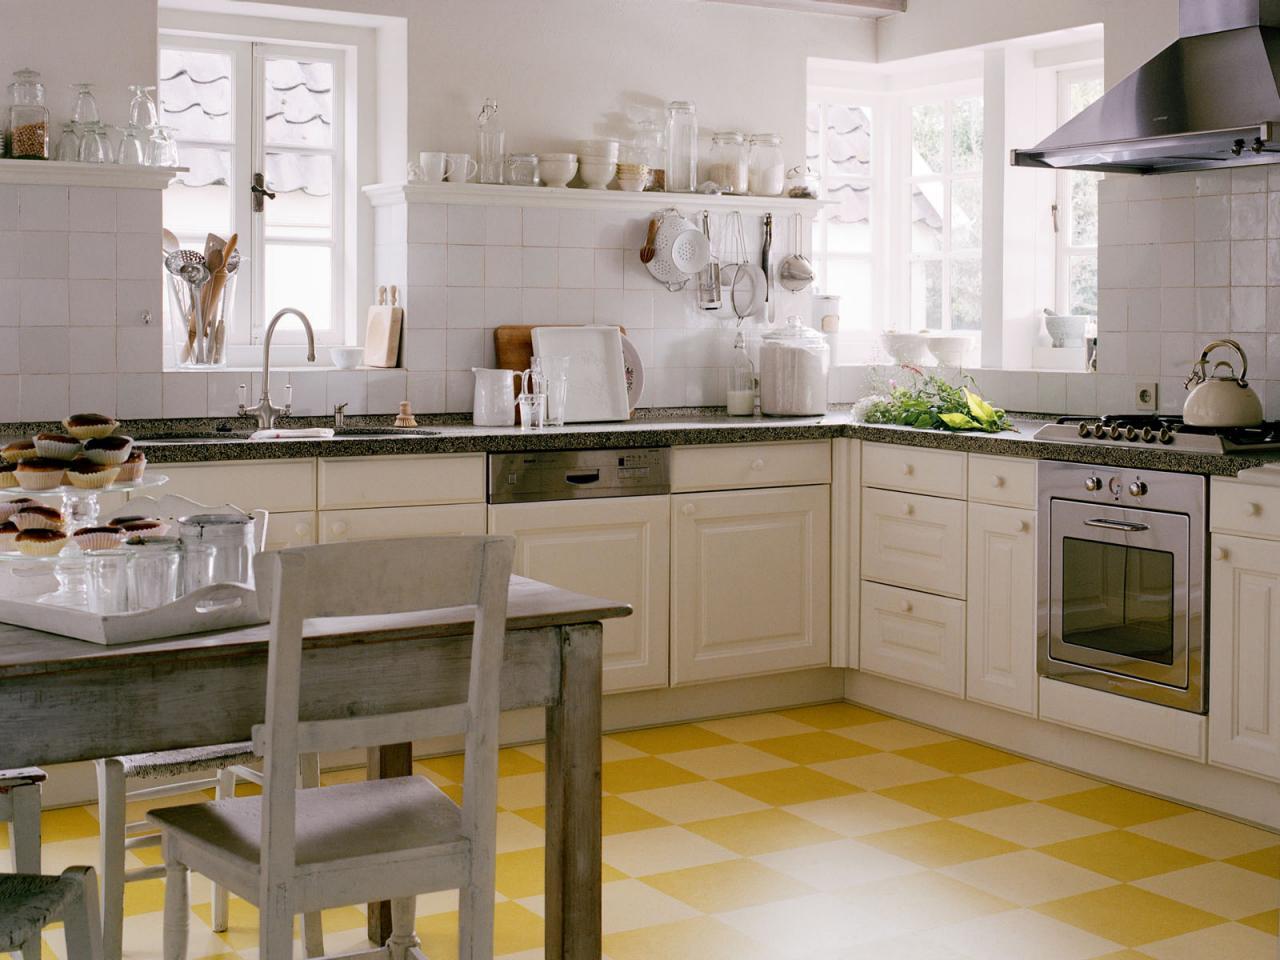 Best flooring for a kitchen - A Splash Of Color